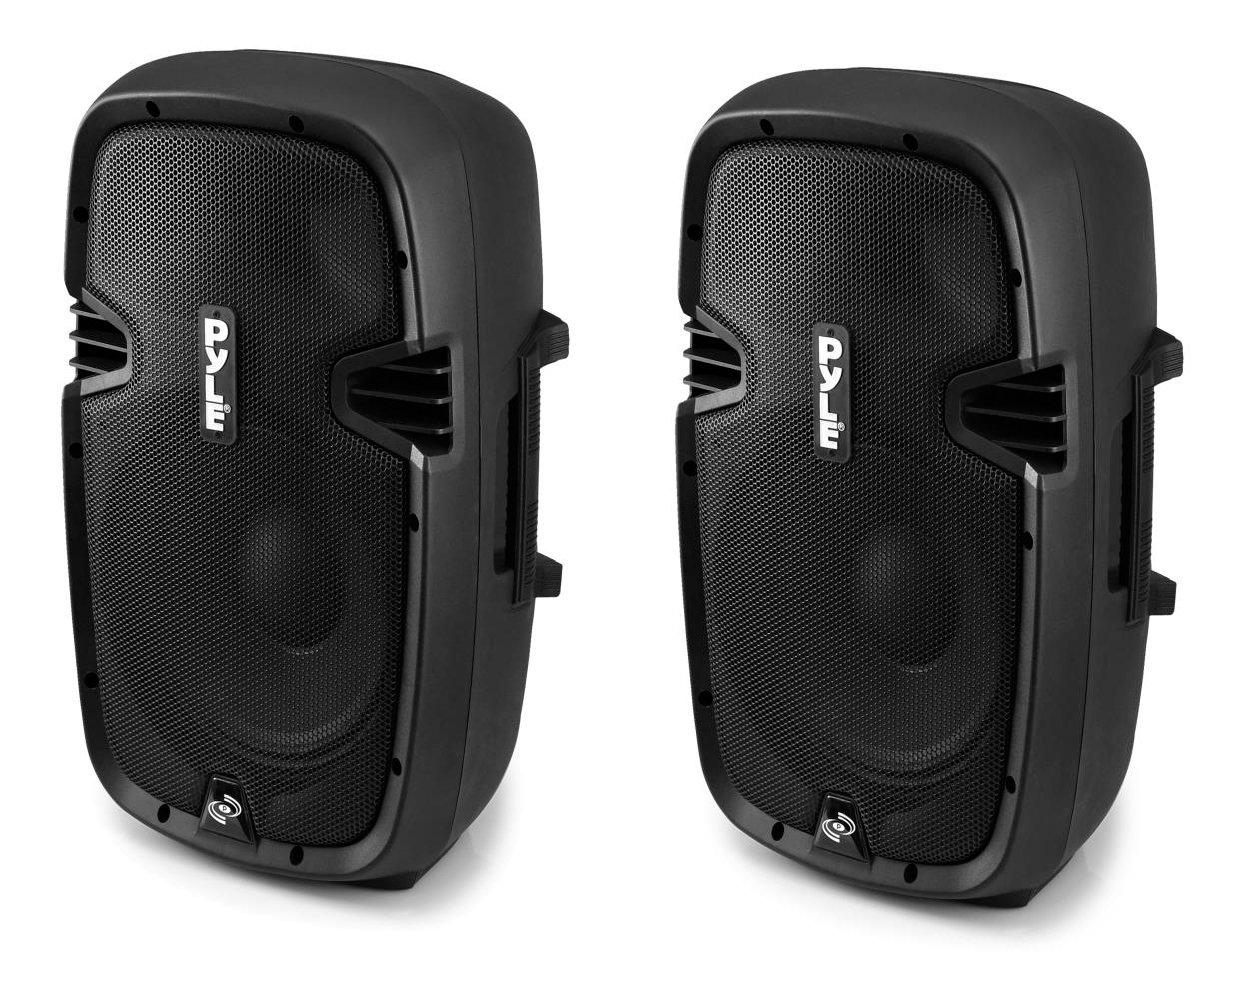 2) PYLE PRO PPHP803MU 1200W 8'' 2-Way Powered PA Speaker System w/ MP3/USB/3.5mm by Pyle Pro